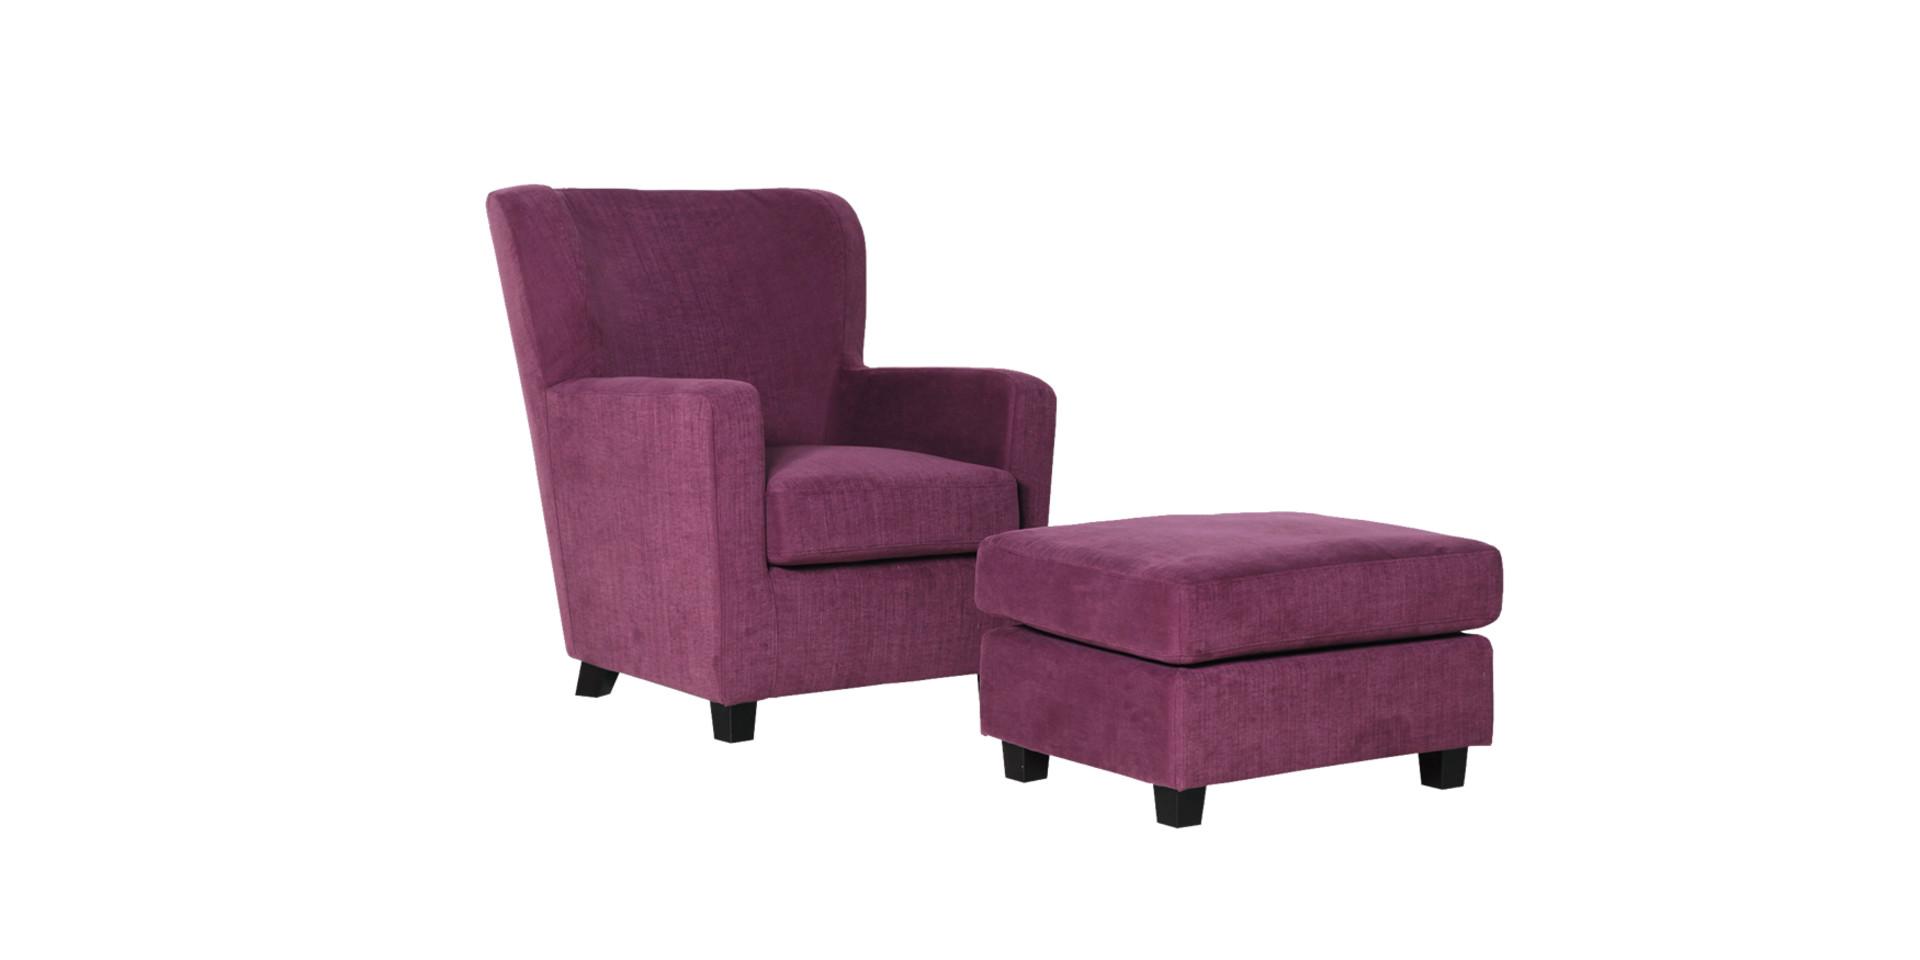 sits-ellen-fauteuil-pouf-armchair_footstool_caleido1524_aubergine_2